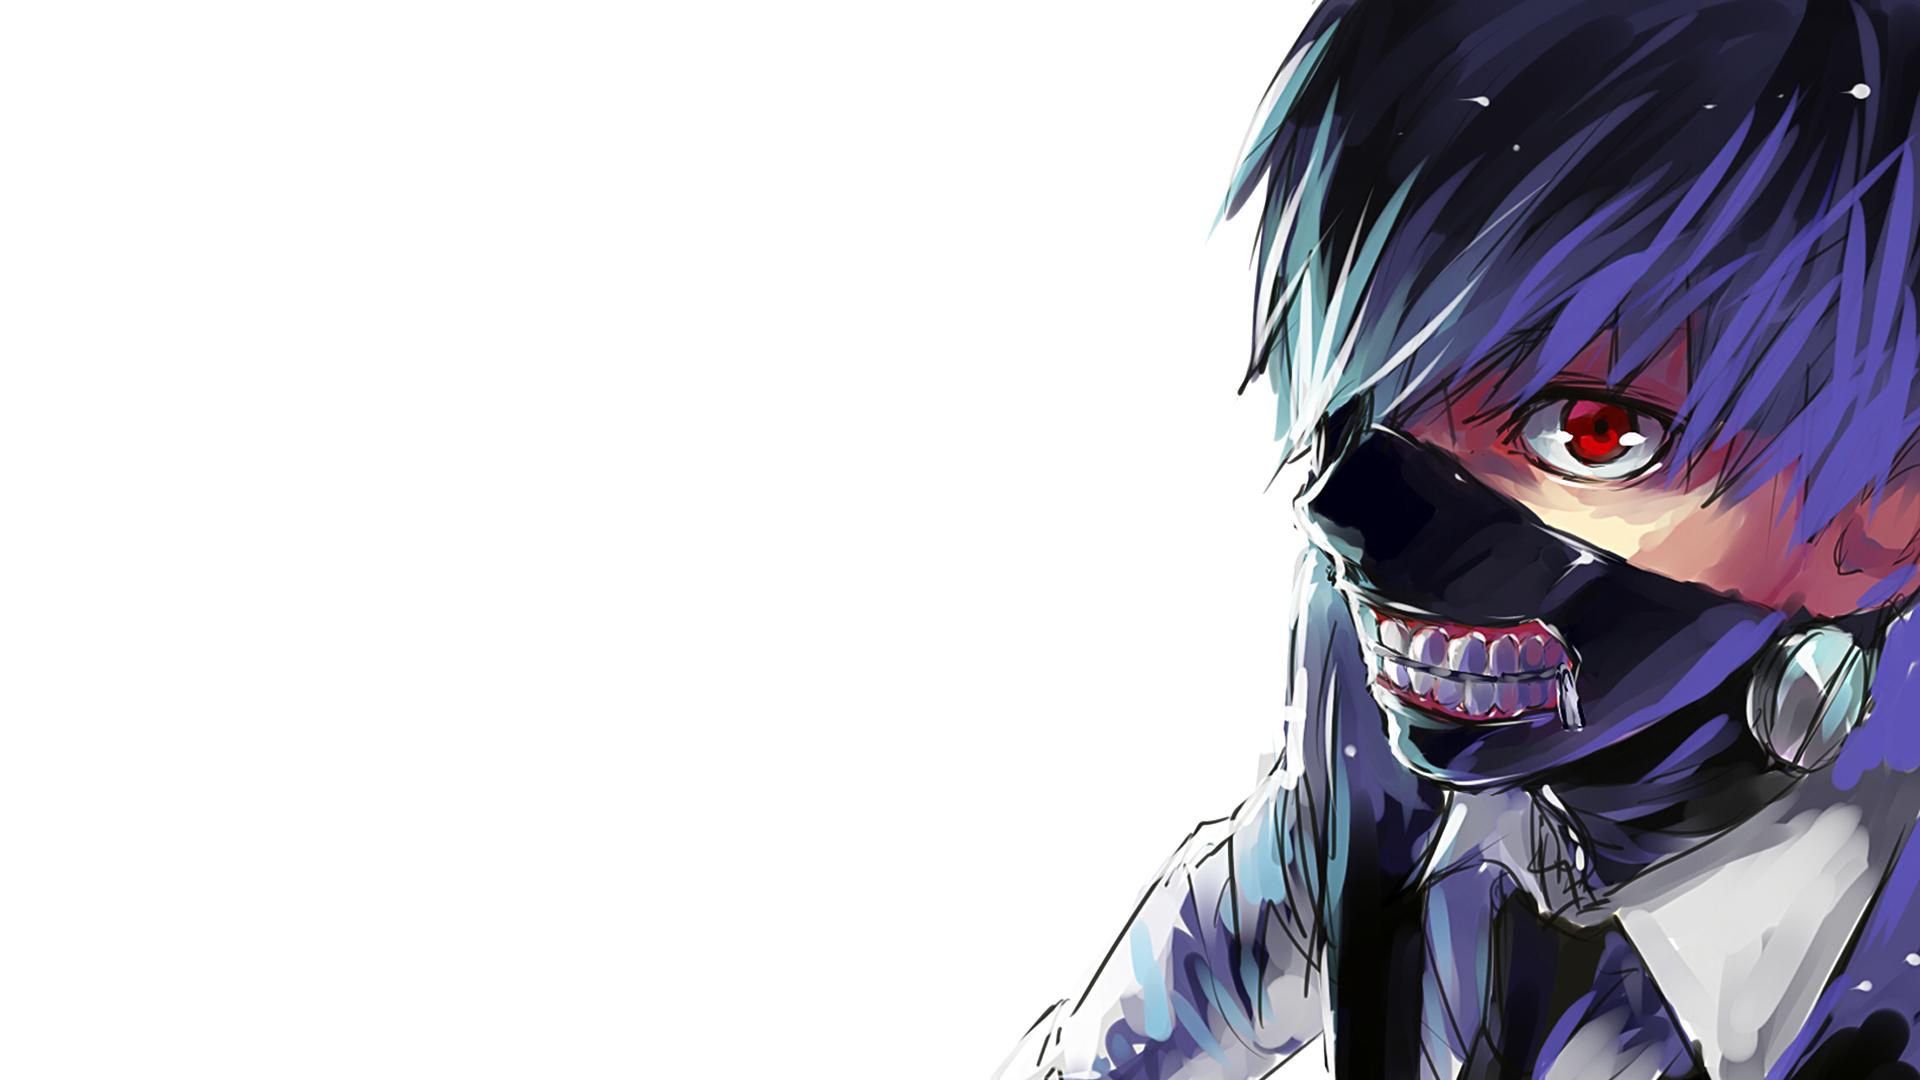 Unduh 4500 Background Anime Tokyo Ghoul HD Terbaru